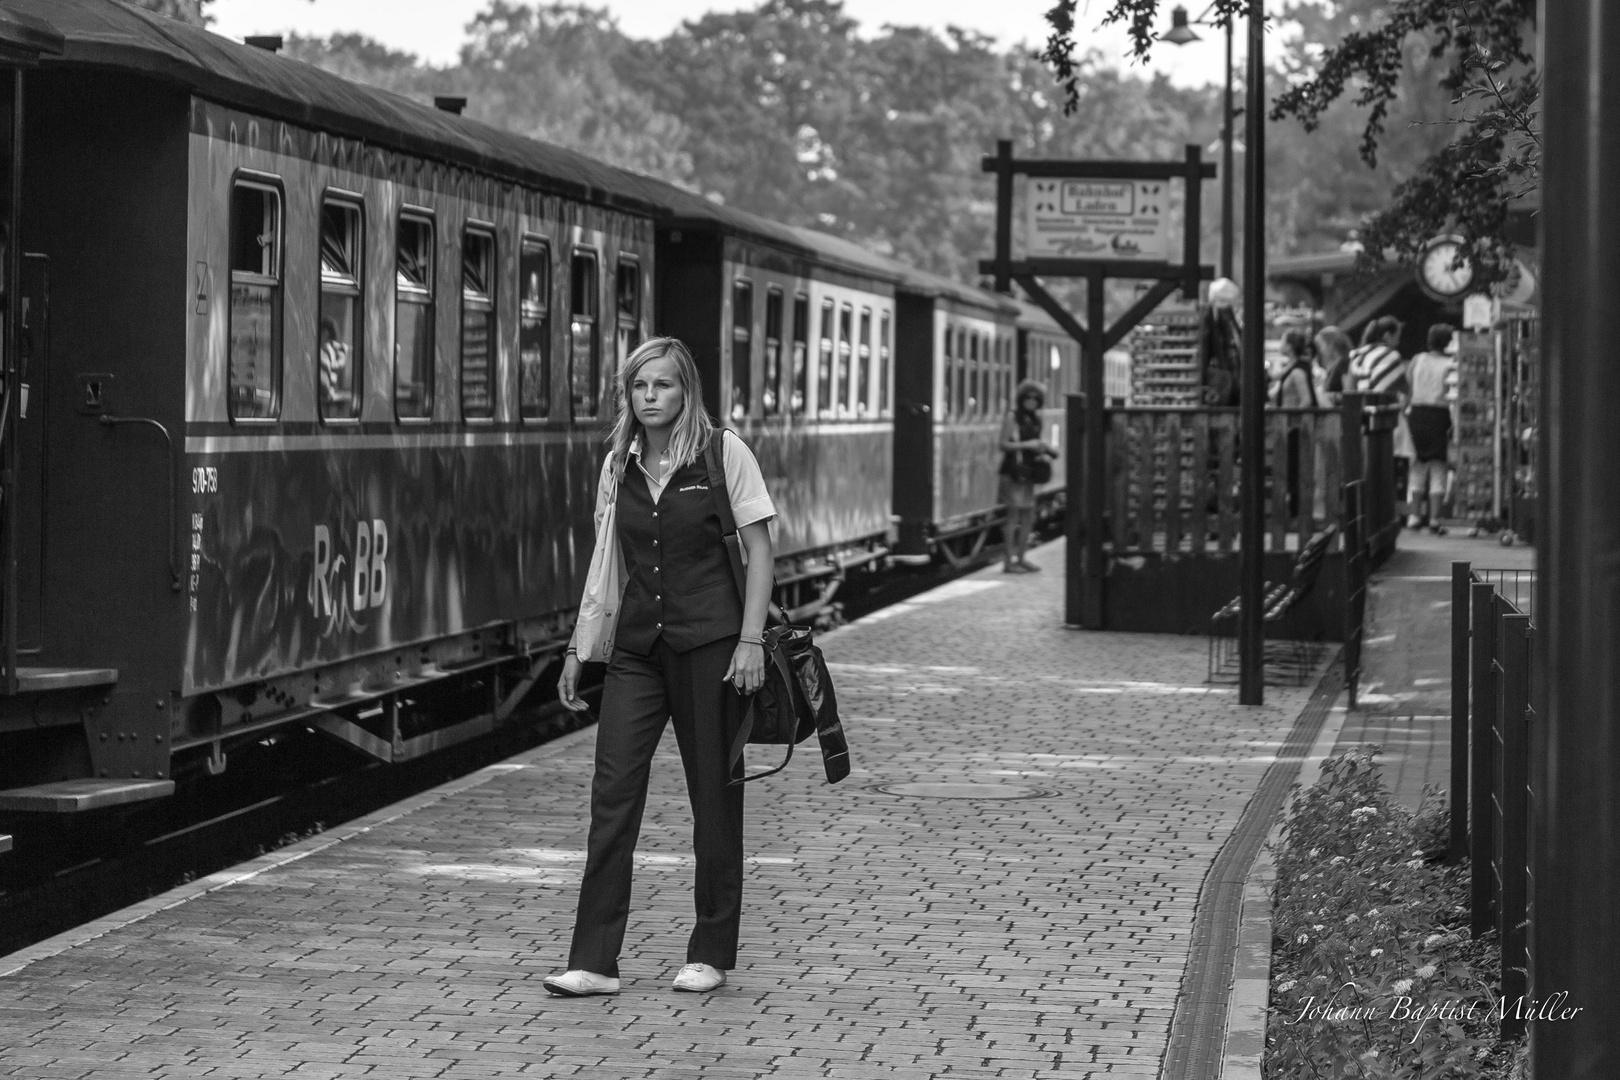 Train: Woman at Work